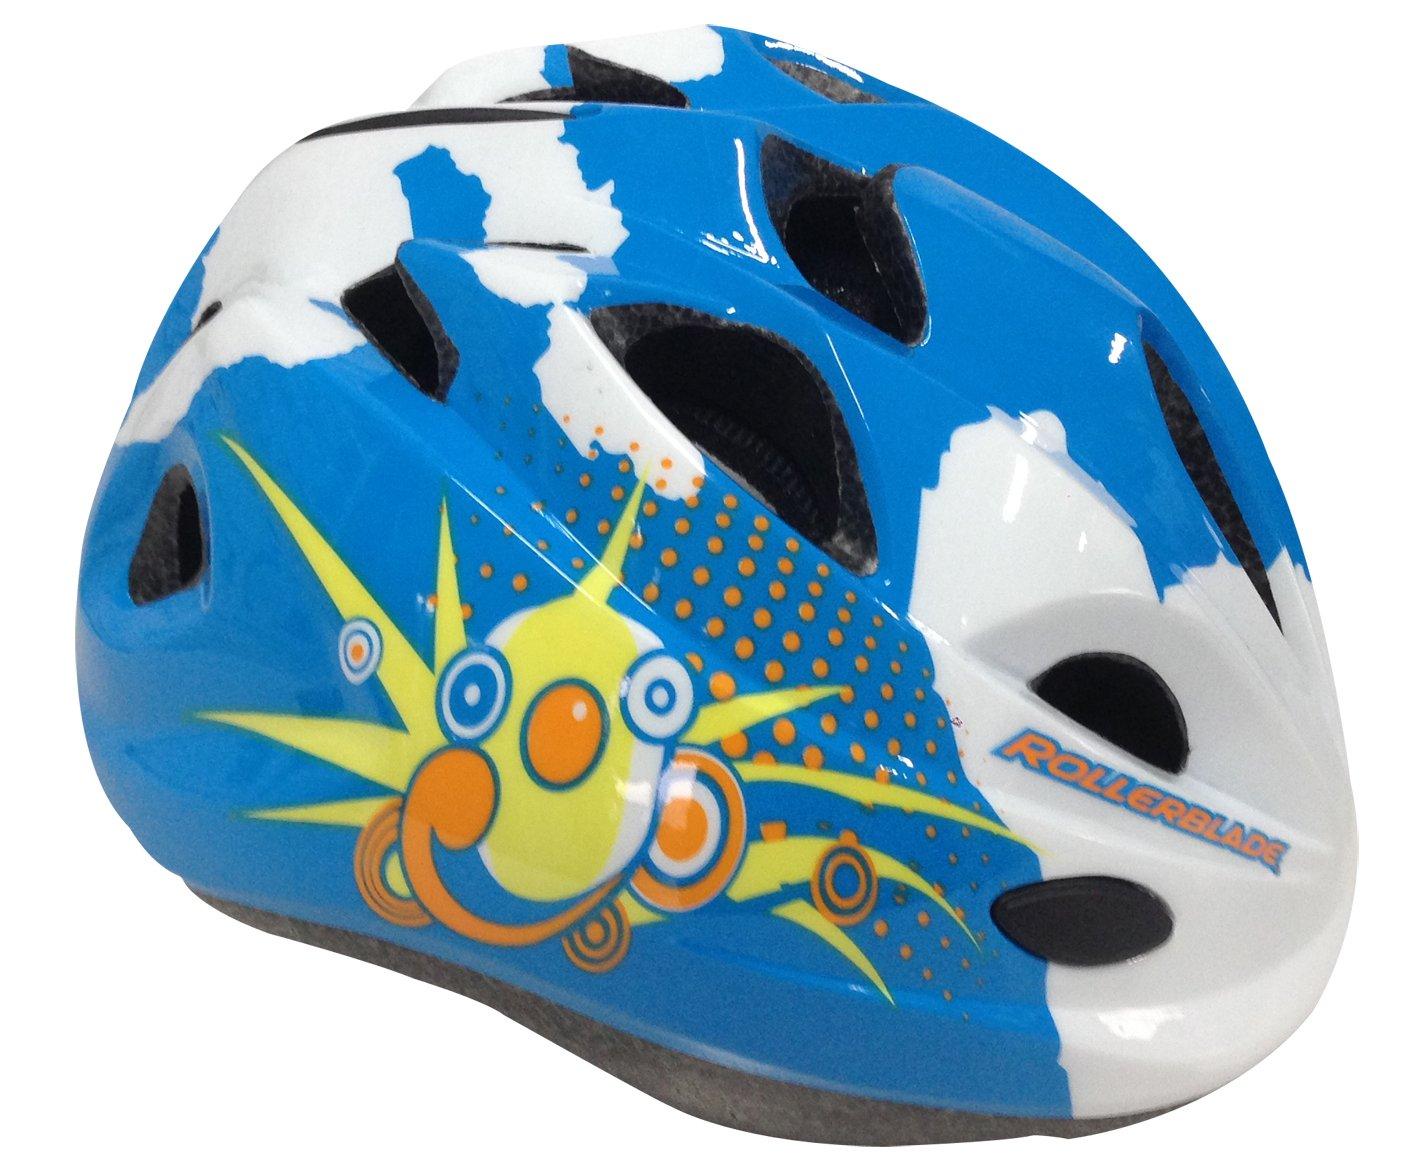 rollerblade 罗勒布雷德 轮滑配件 儿童头盔 rb eagle